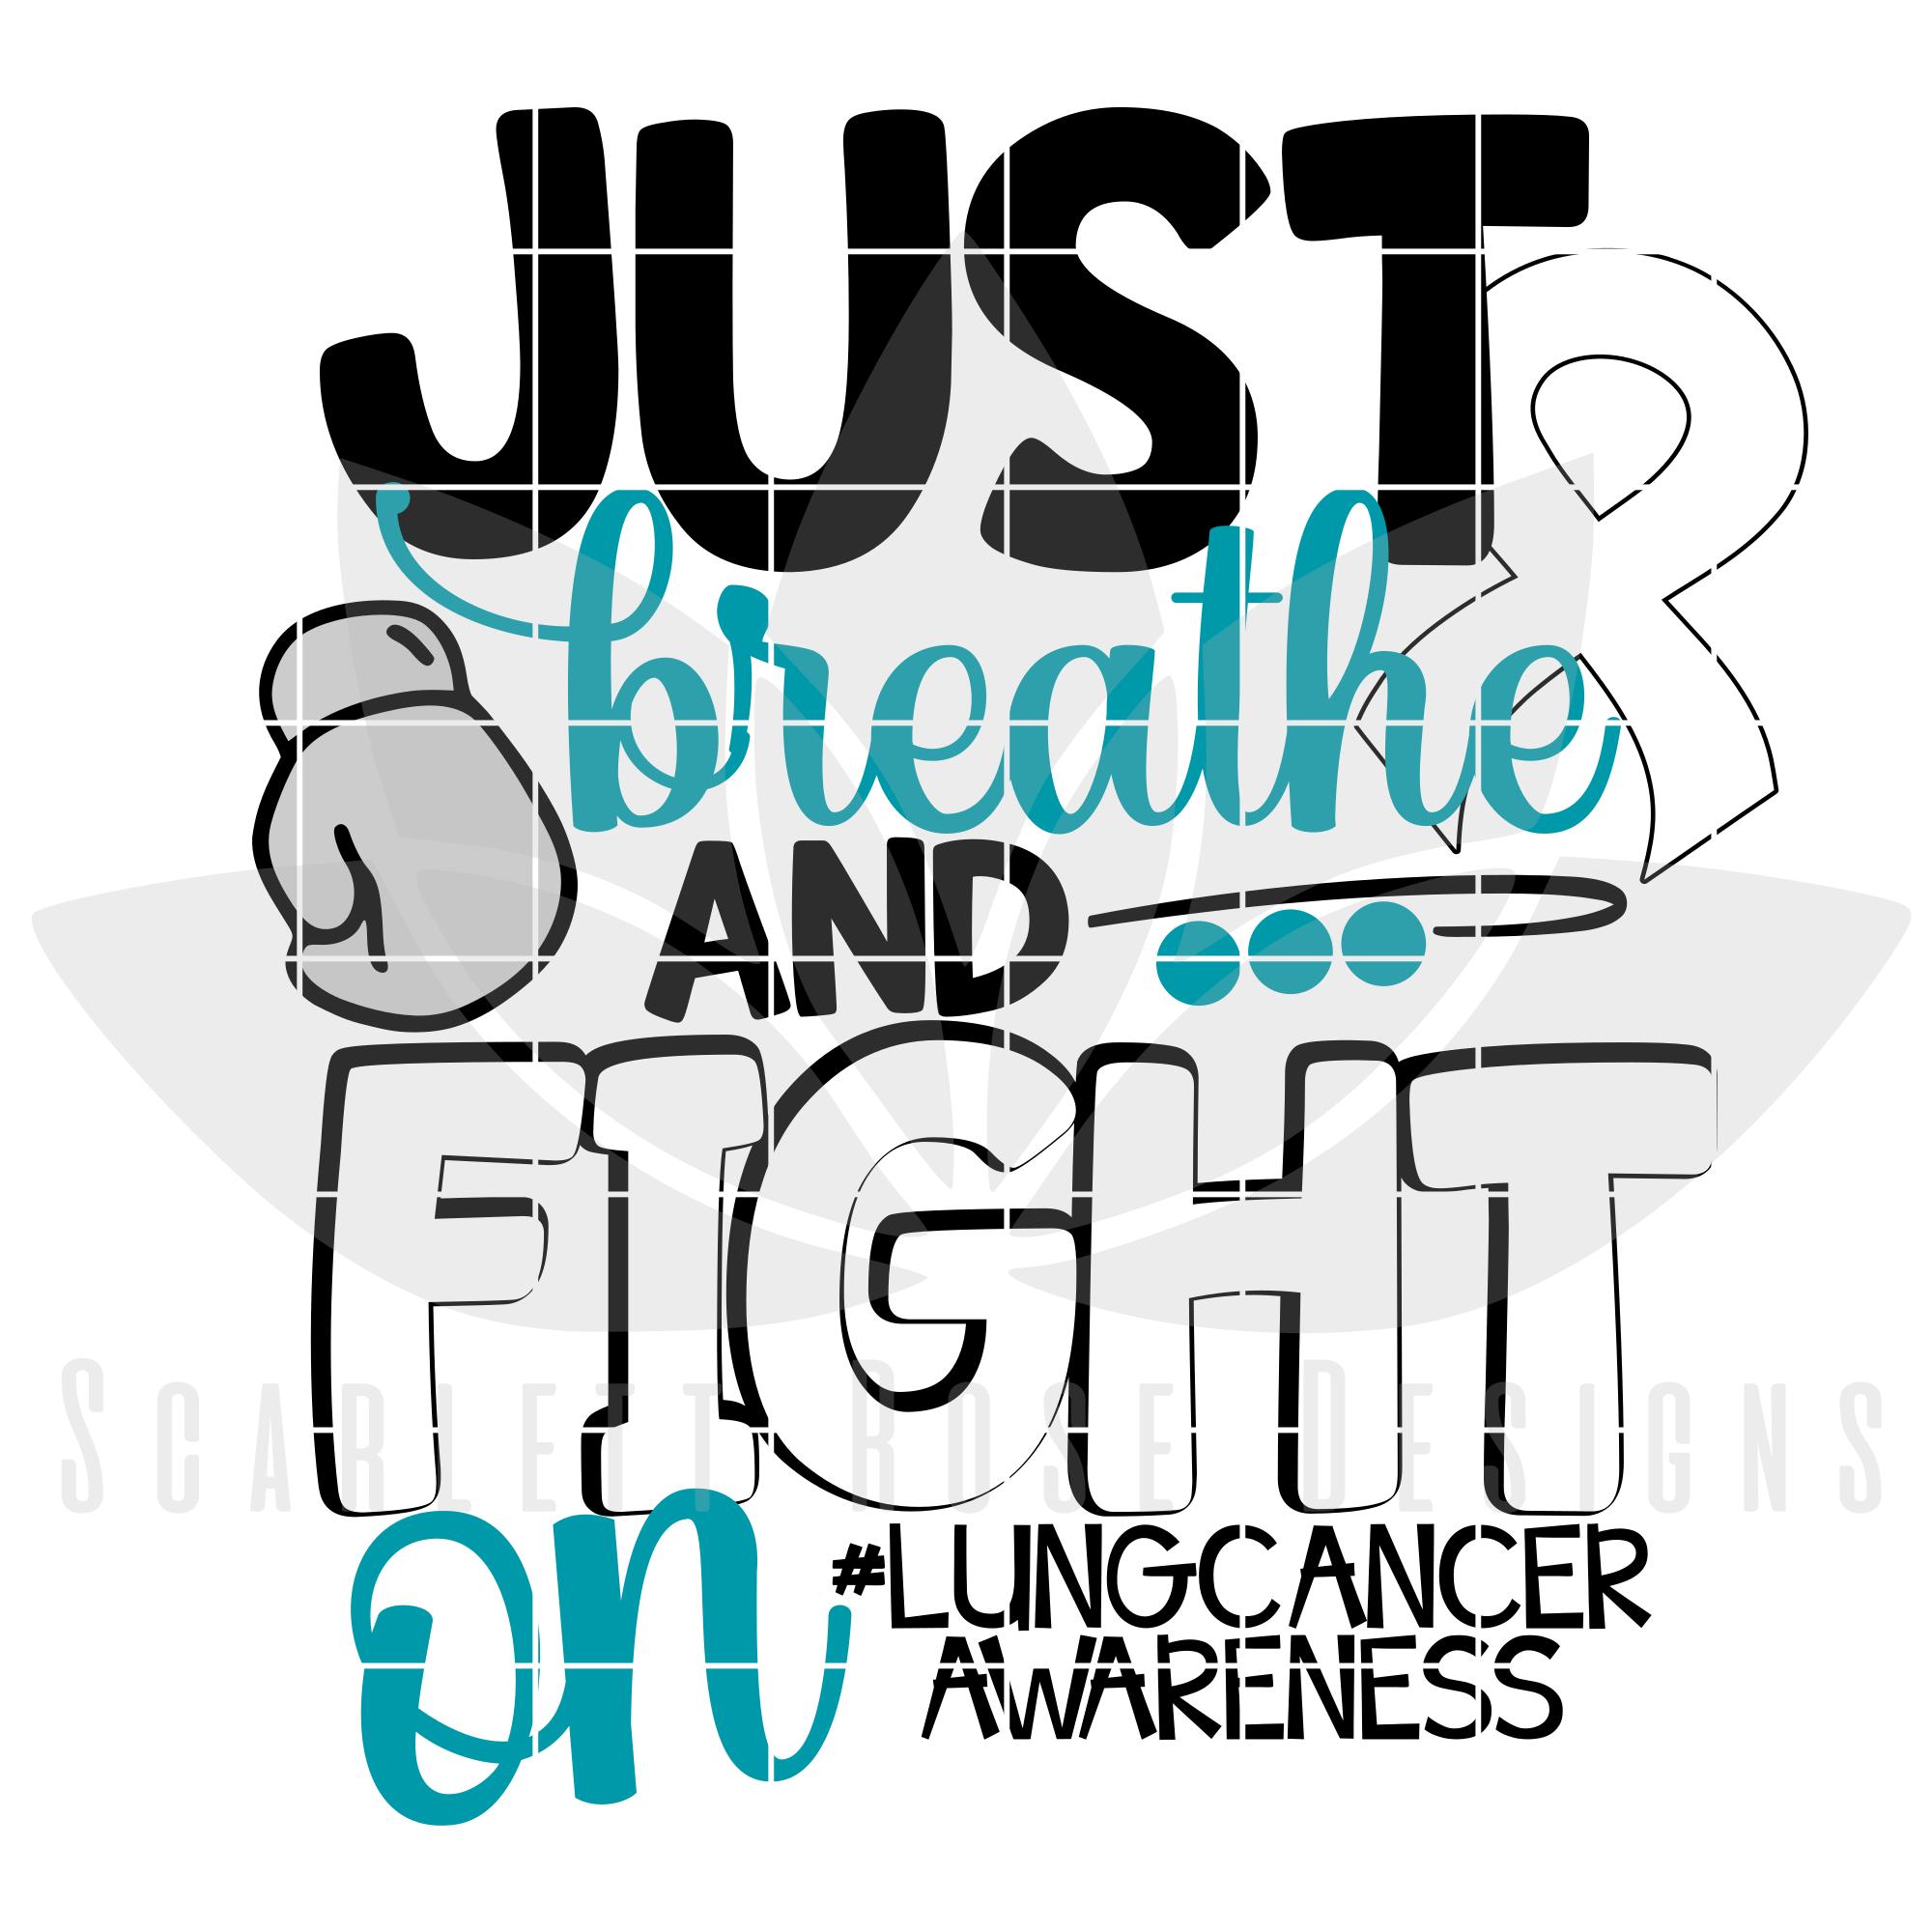 Team pearl for lung cancer awareness svg clipart image transparent Lung Cancer Awareness Month Shirts image transparent